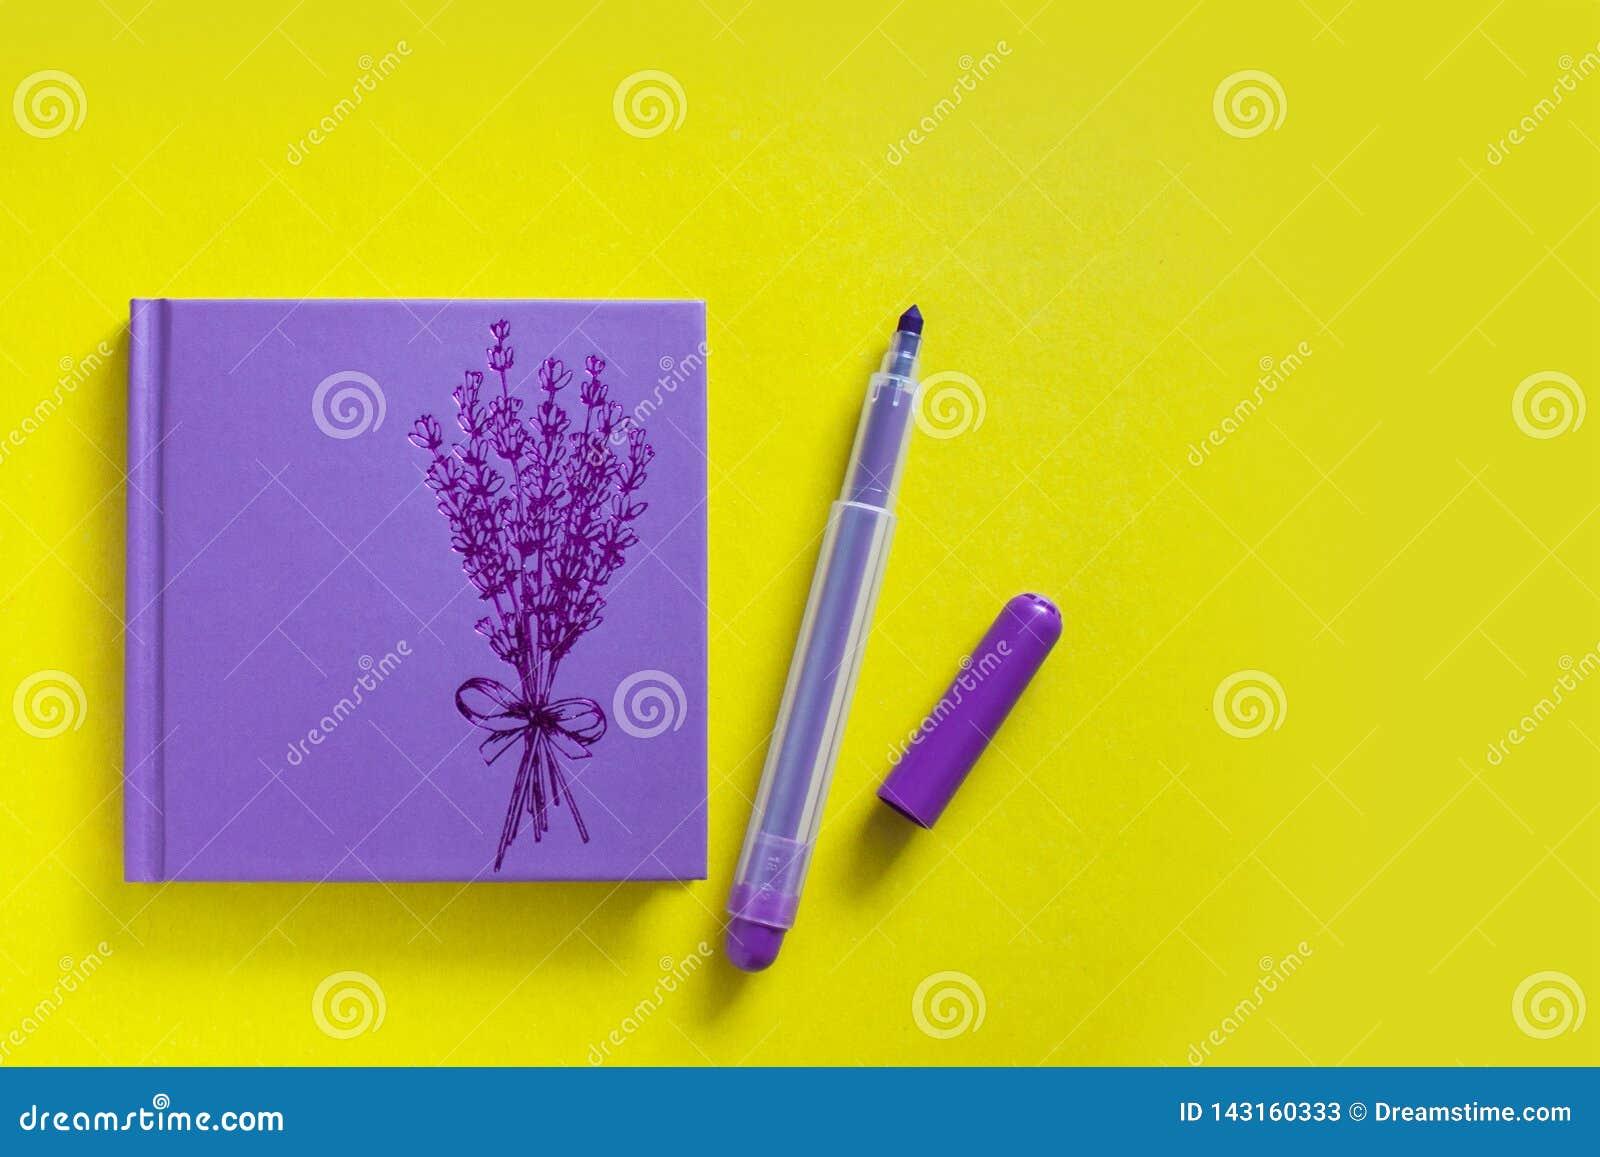 Bloco de notas lilás com a pena de feltro no fundo amarelo